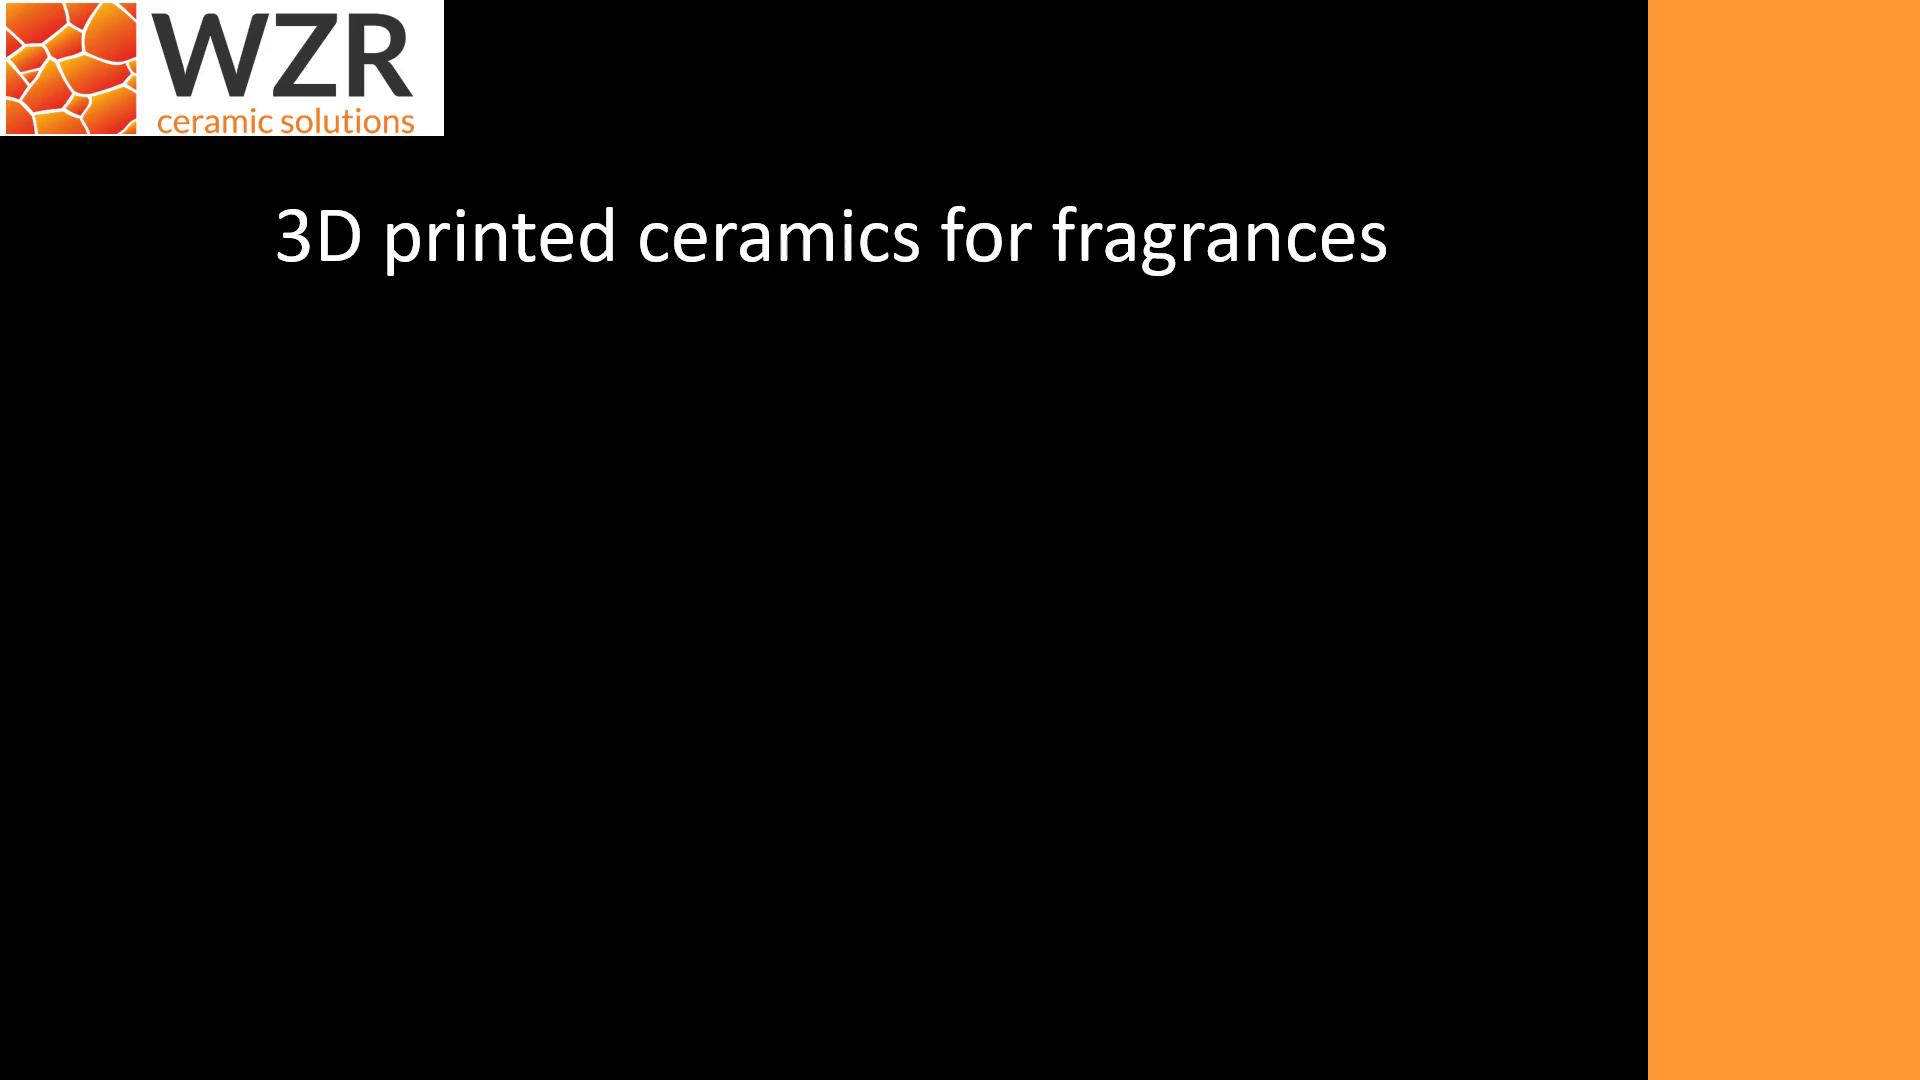 3D printed ceramics for fragrances